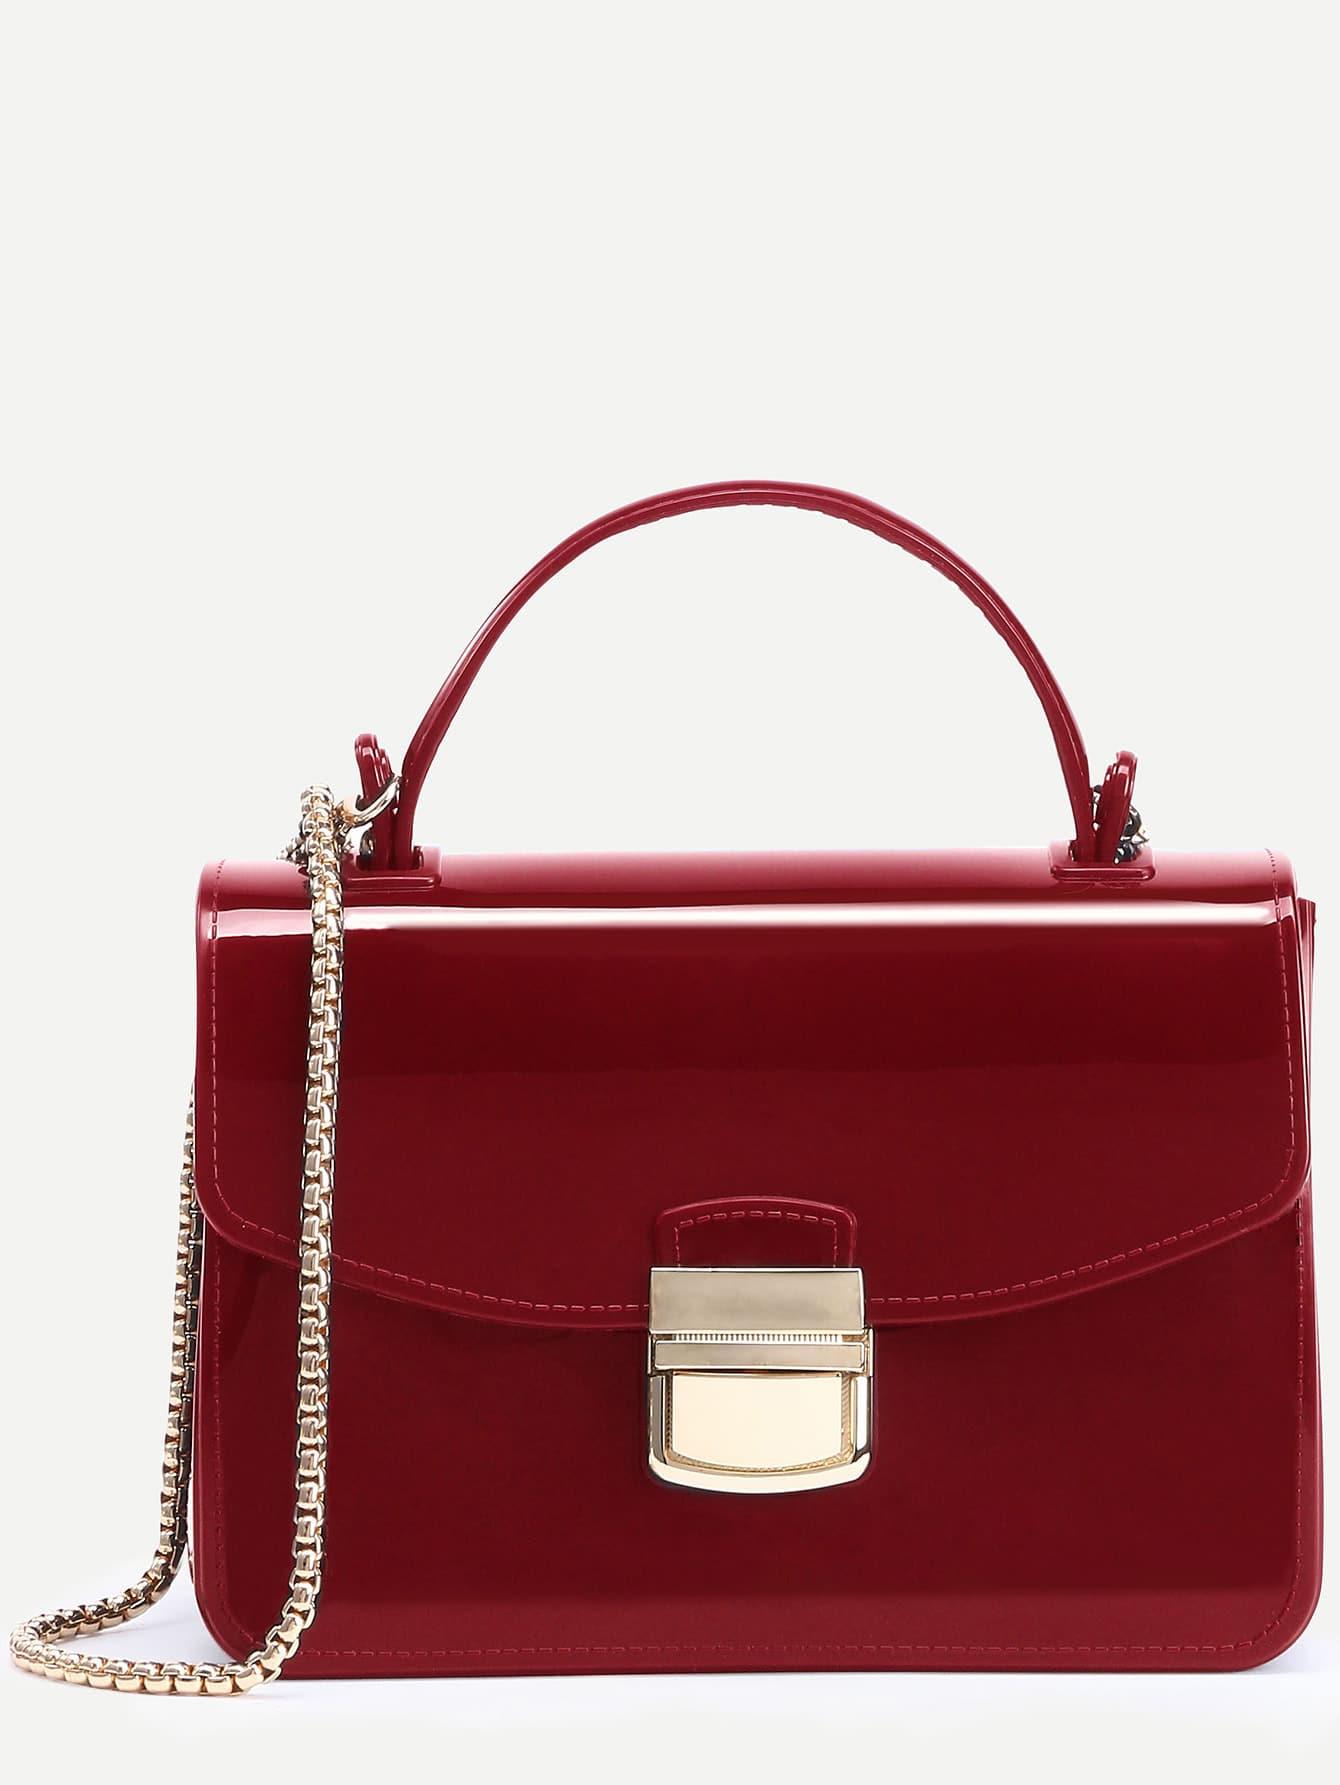 Pushlock Closure Plastic Handbag With Chain